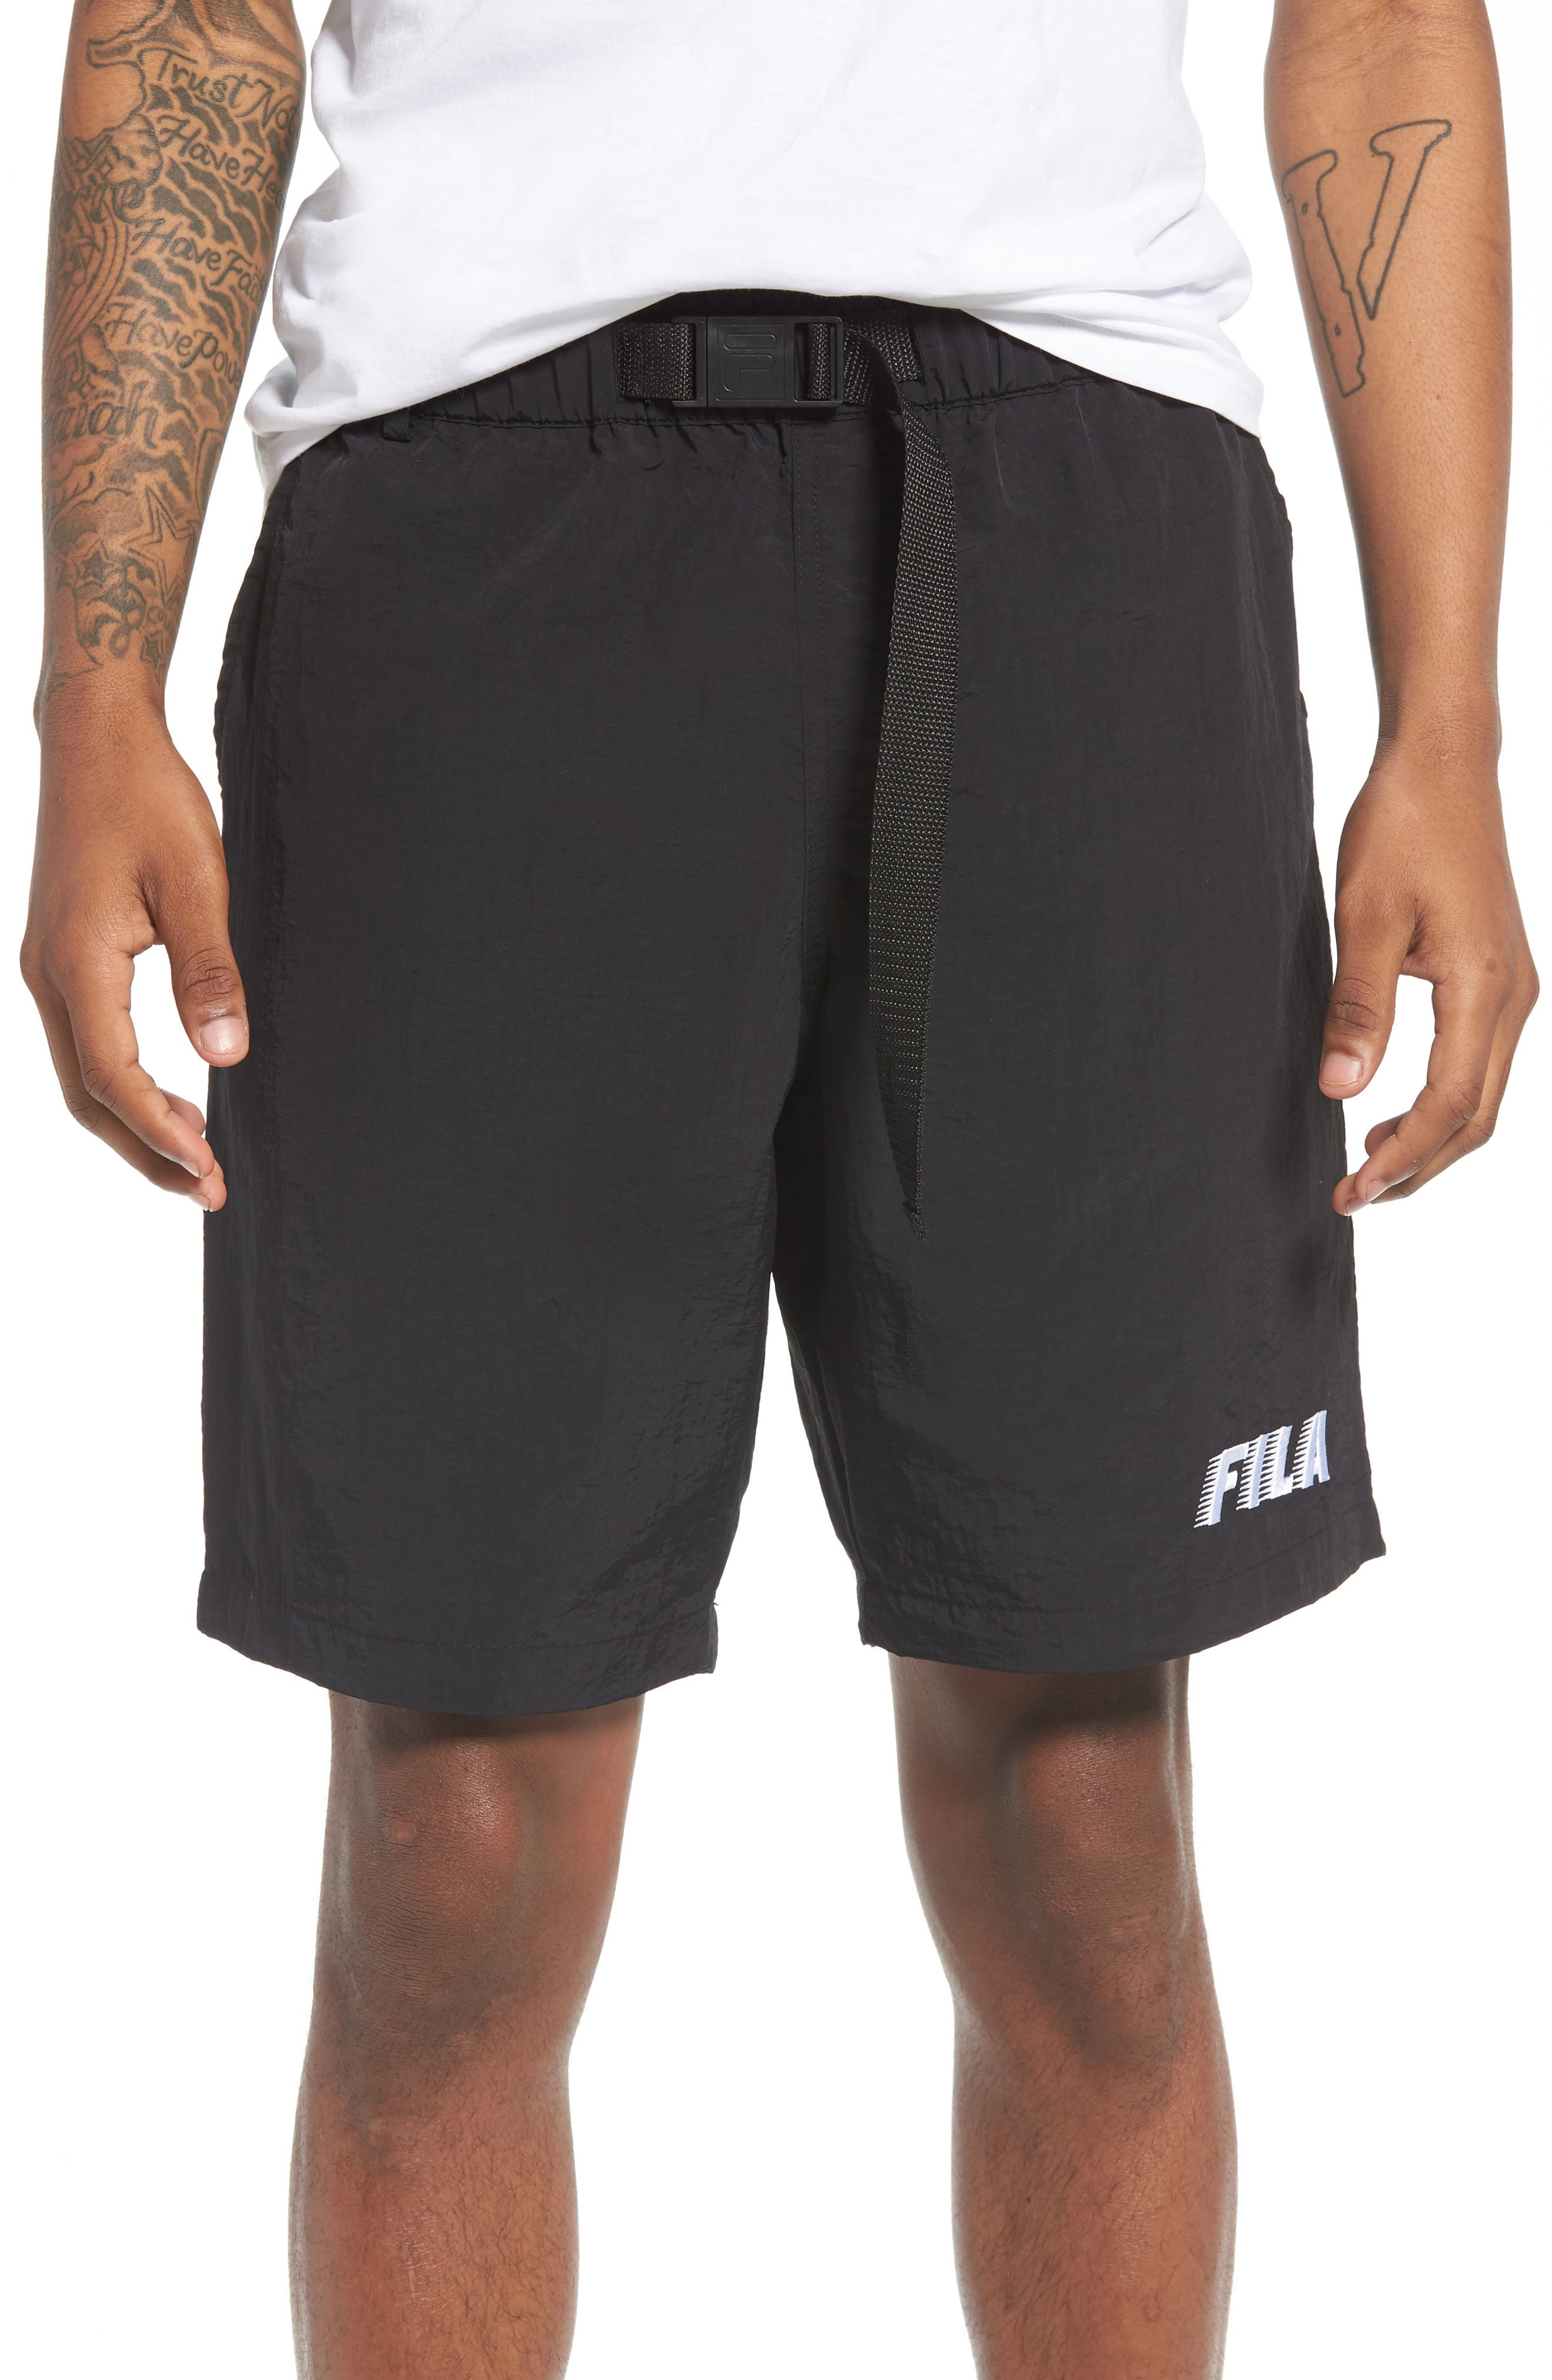 Mondy Shorts,                             Main thumbnail 1, color,                             001